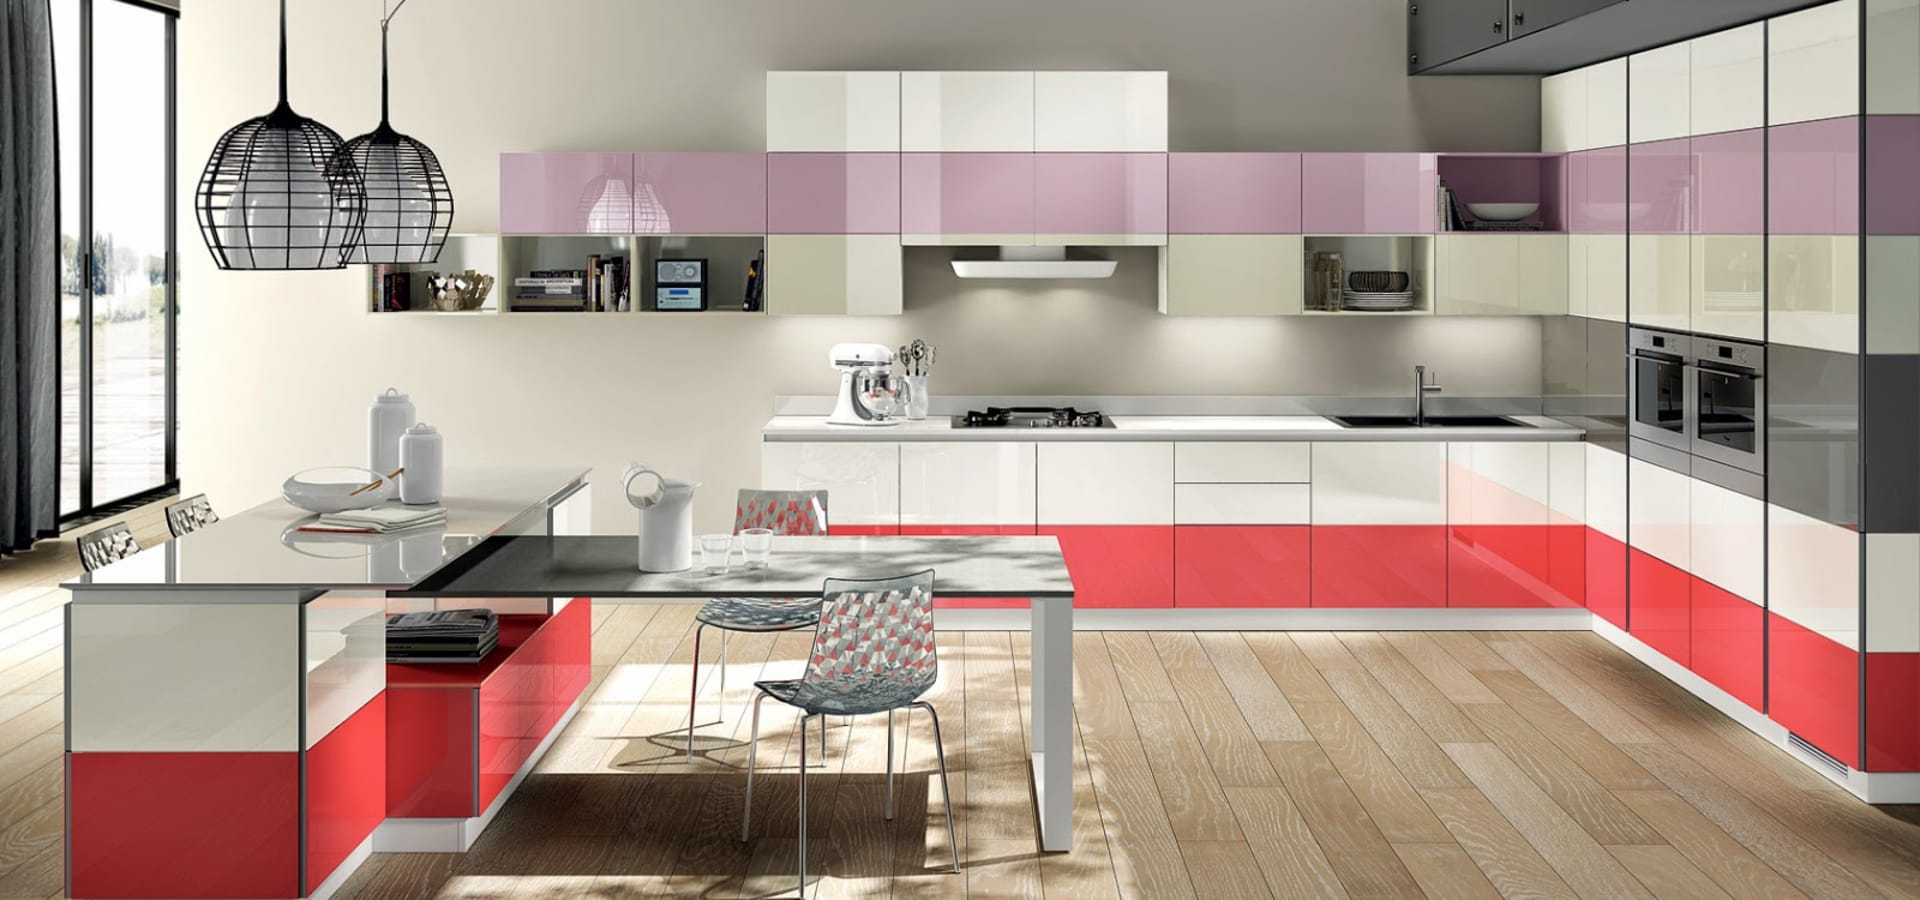 modular kitchen in Indore   homify